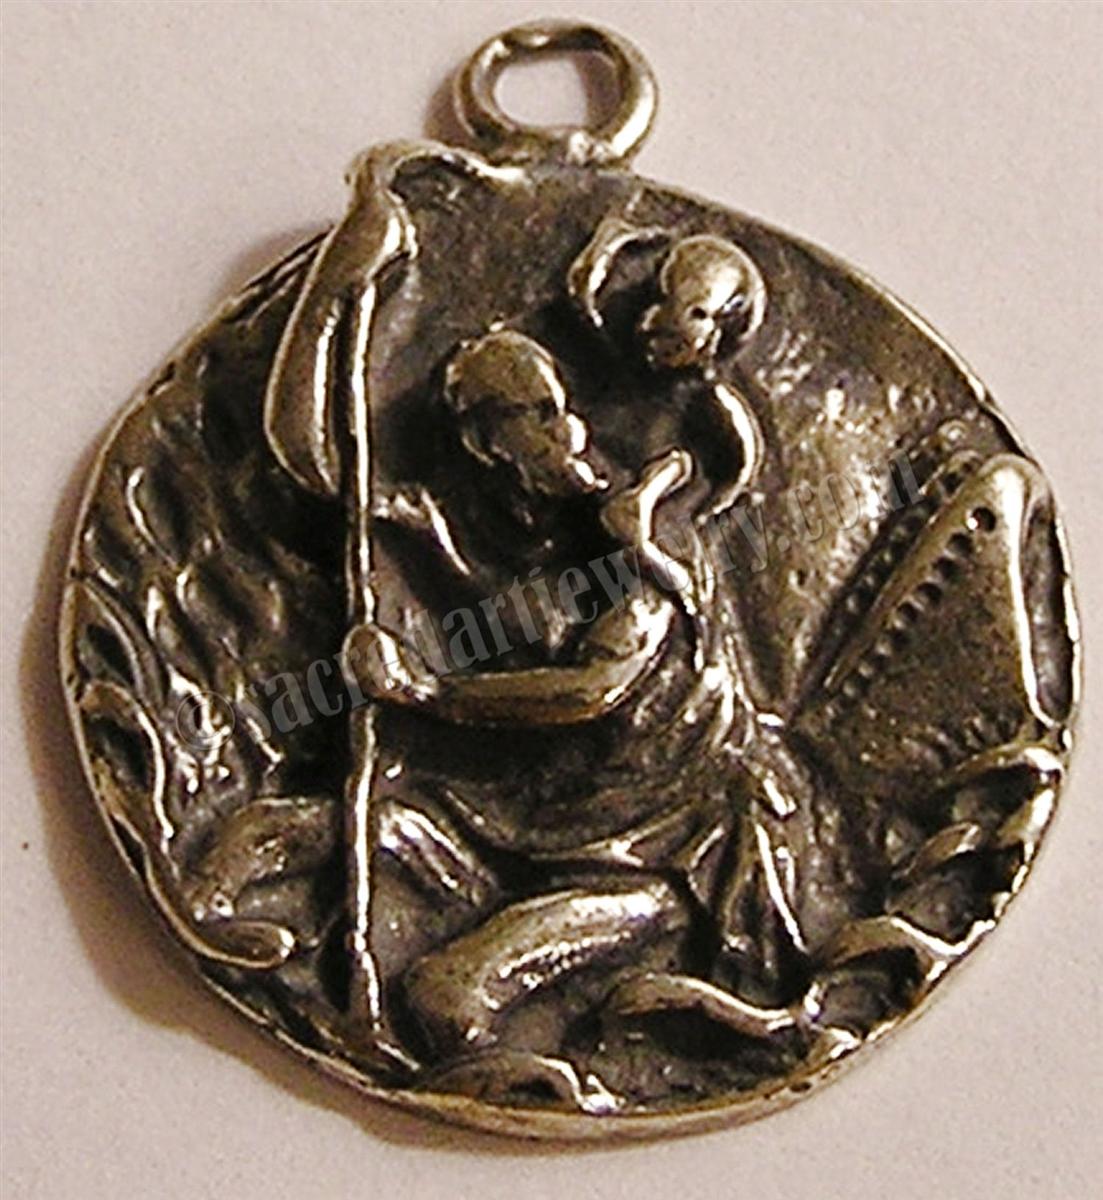 St Christopher Antique Religious Pendant.